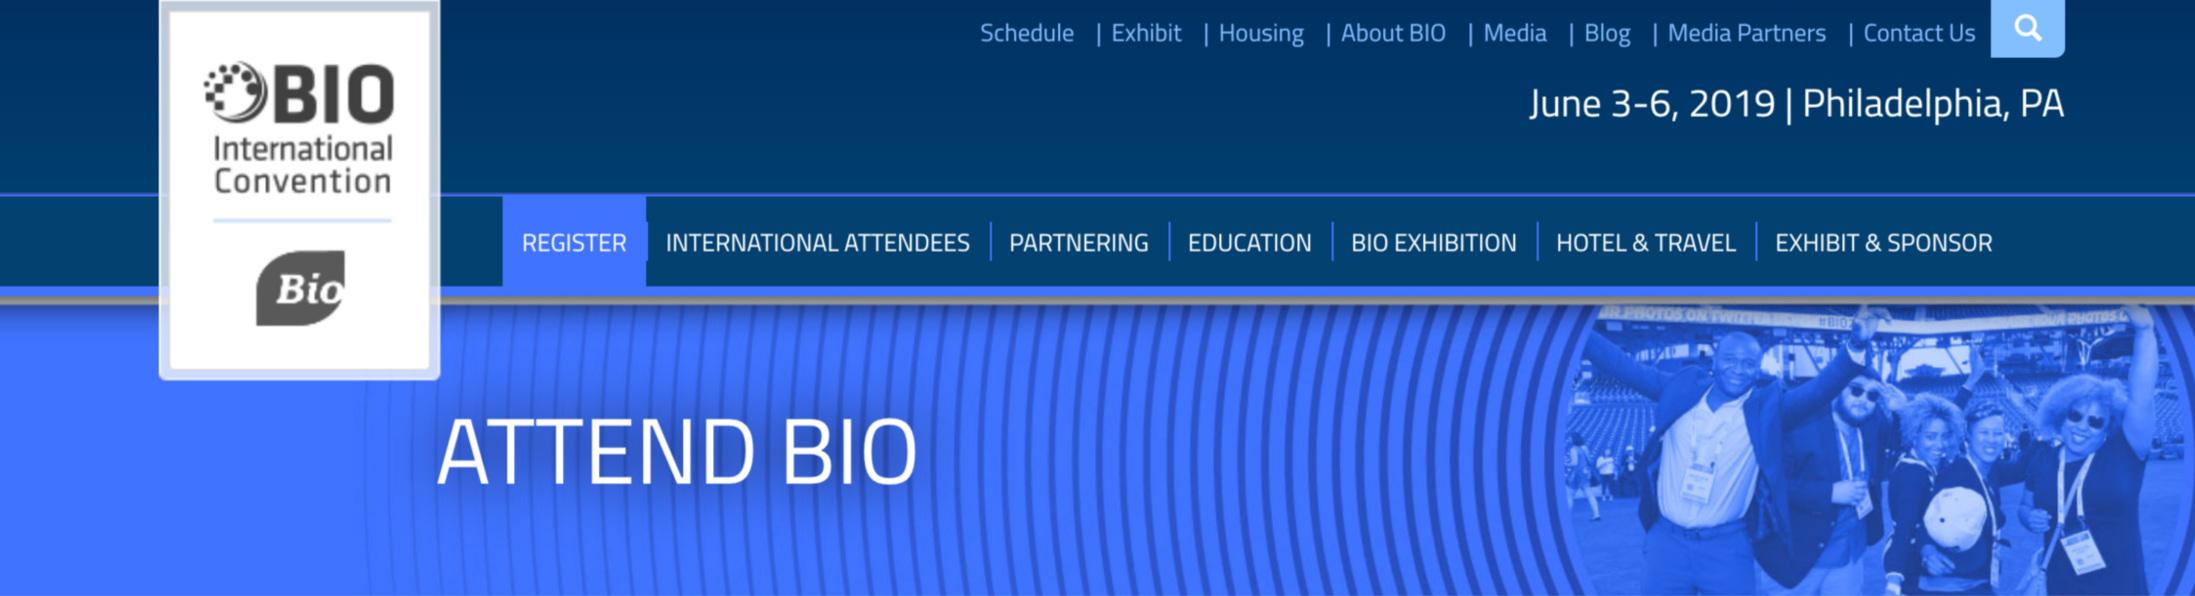 screenshot of the BIO 2019 website